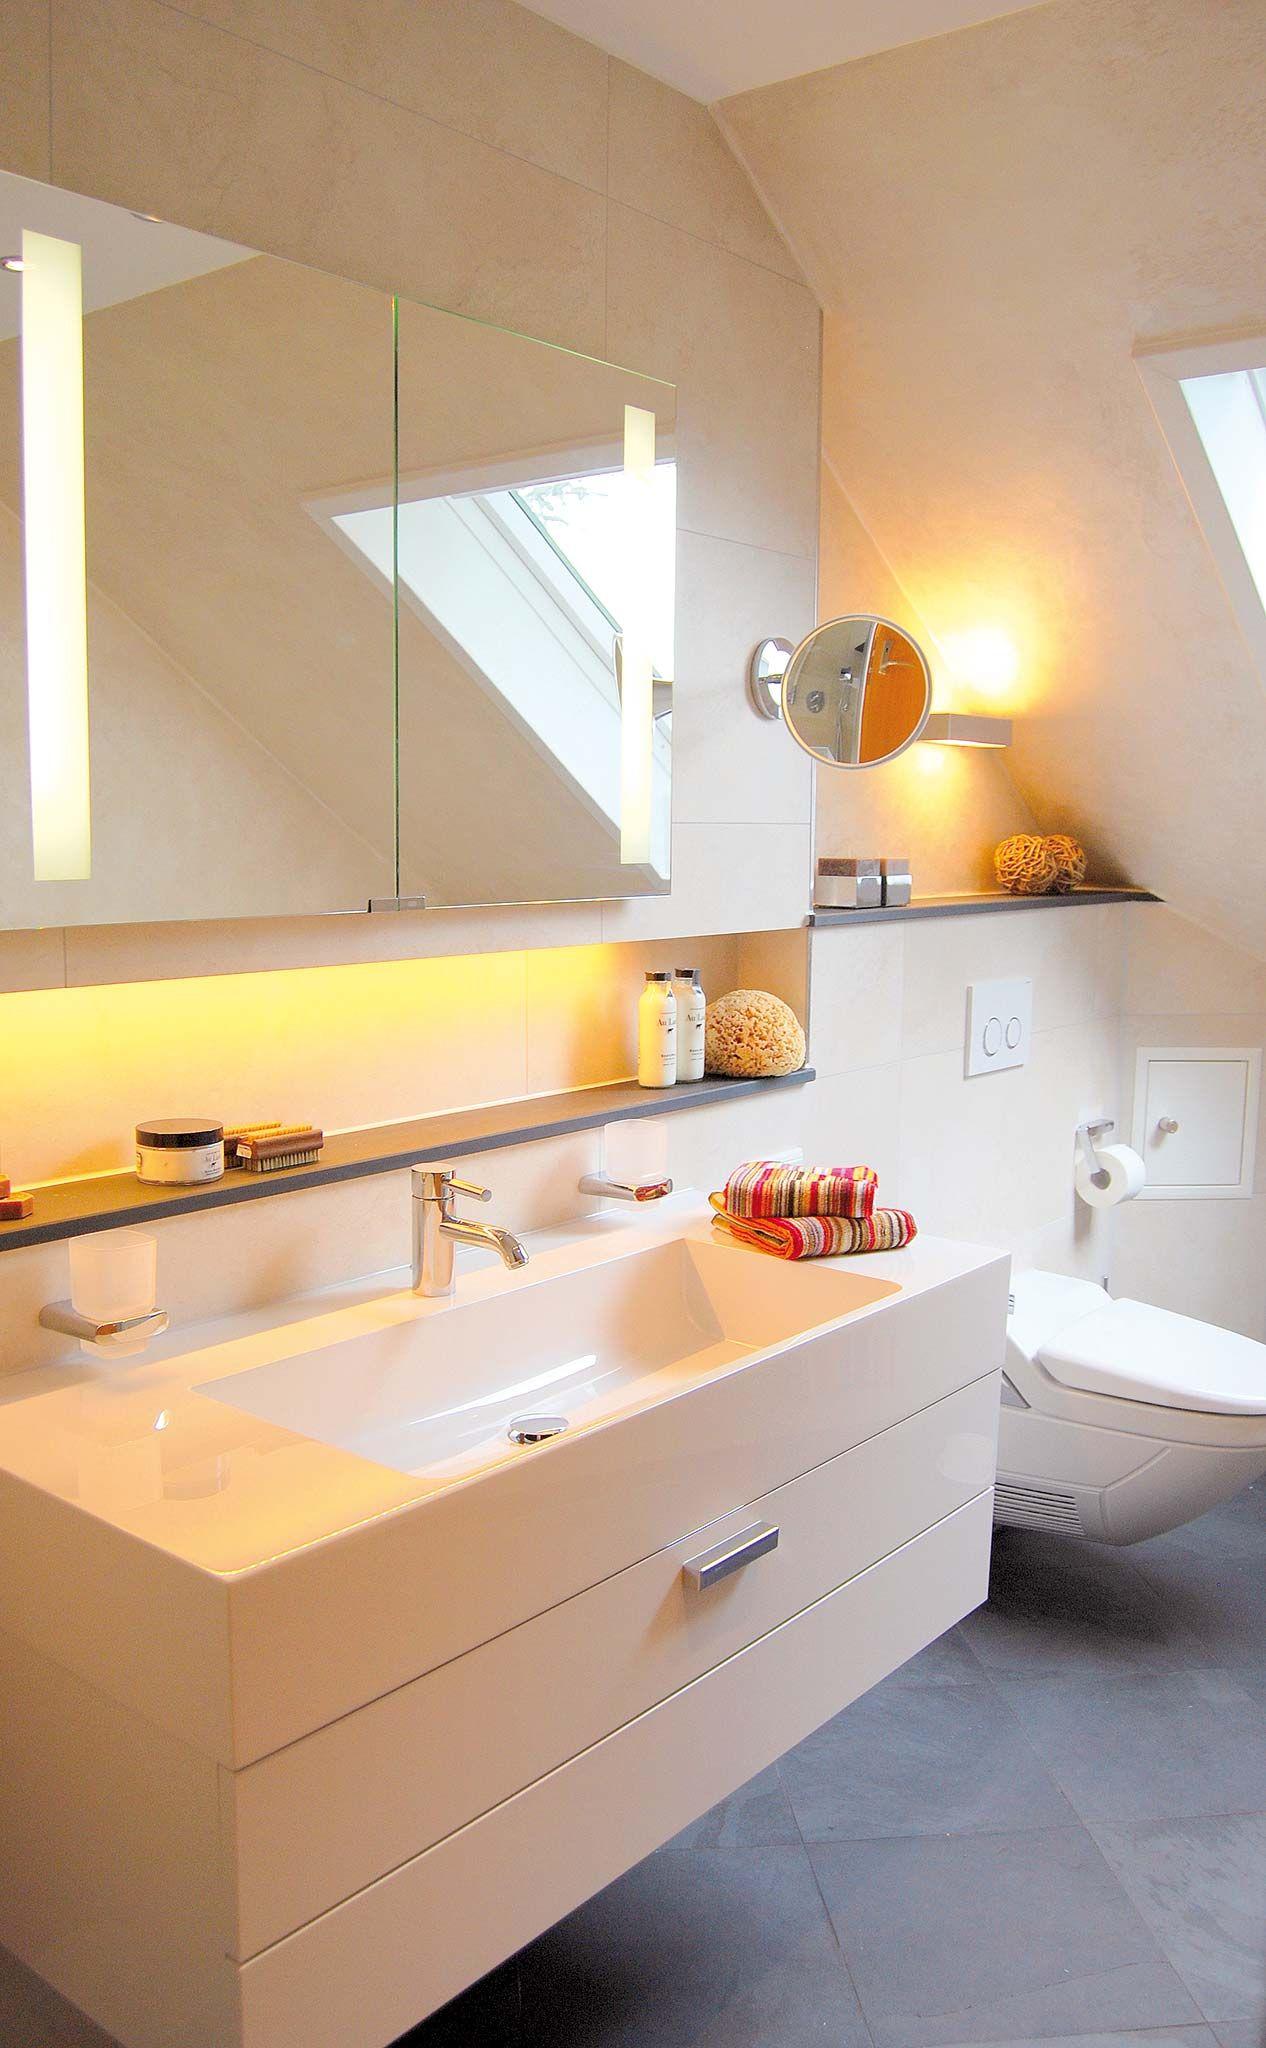 Badezimmer Spiegelschrank beleuchtung, Badezimmer